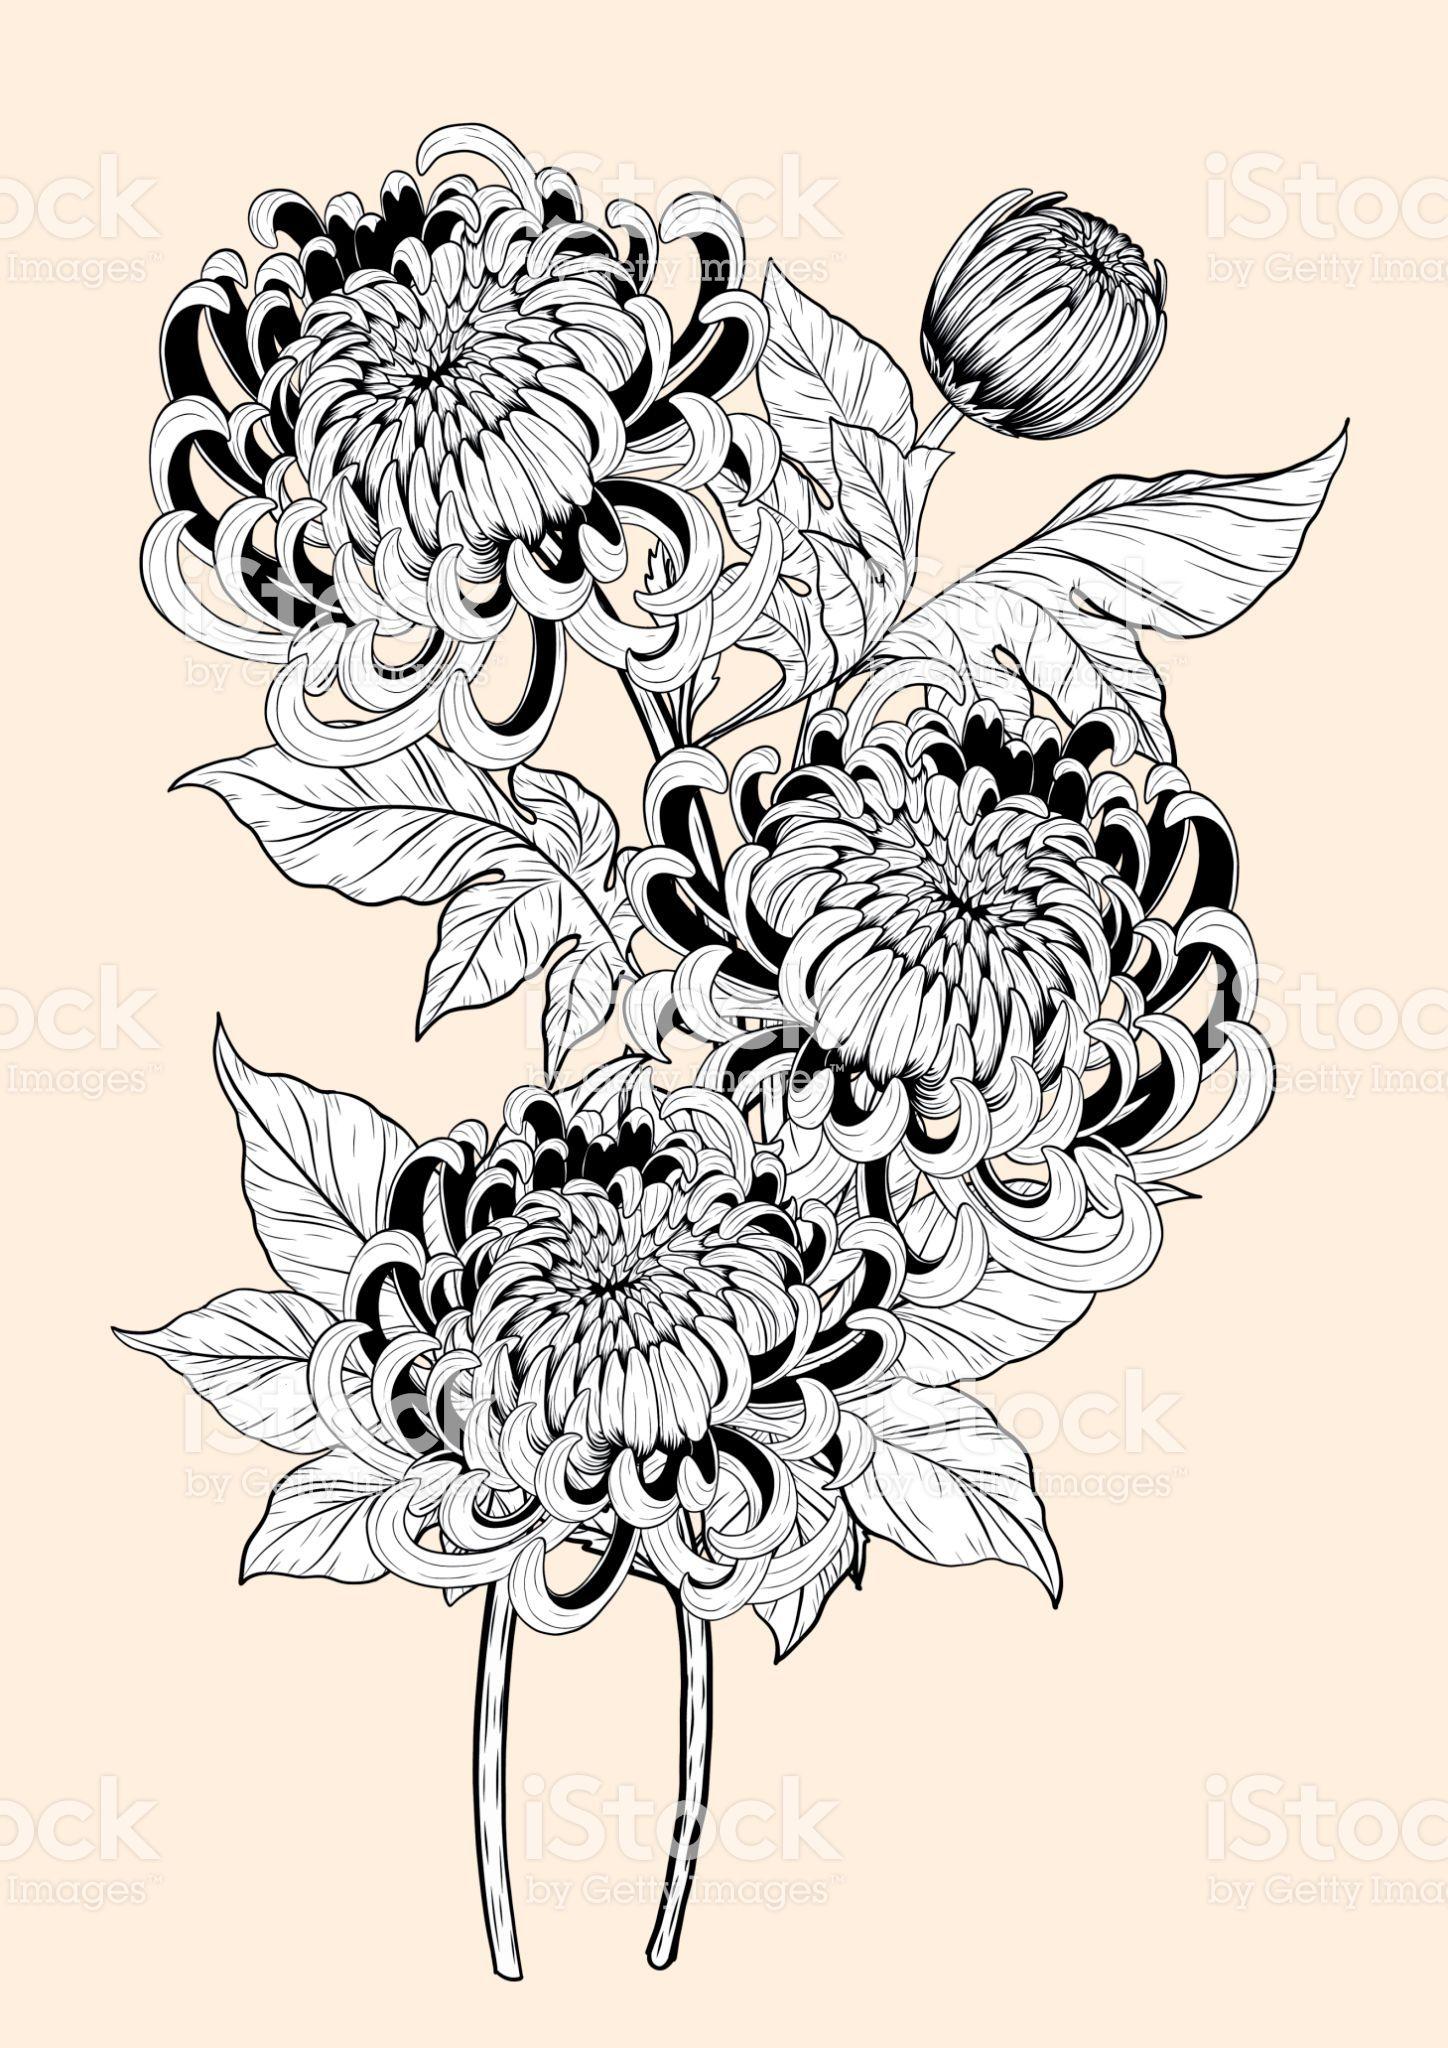 Chrysanthemum Vector On Brown Background Chrysanthemum Flower By Hand Drawing Royalty Free Chrysanth Chrysanthemum Tattoo Chrysanthemum Drawing Flower Drawing